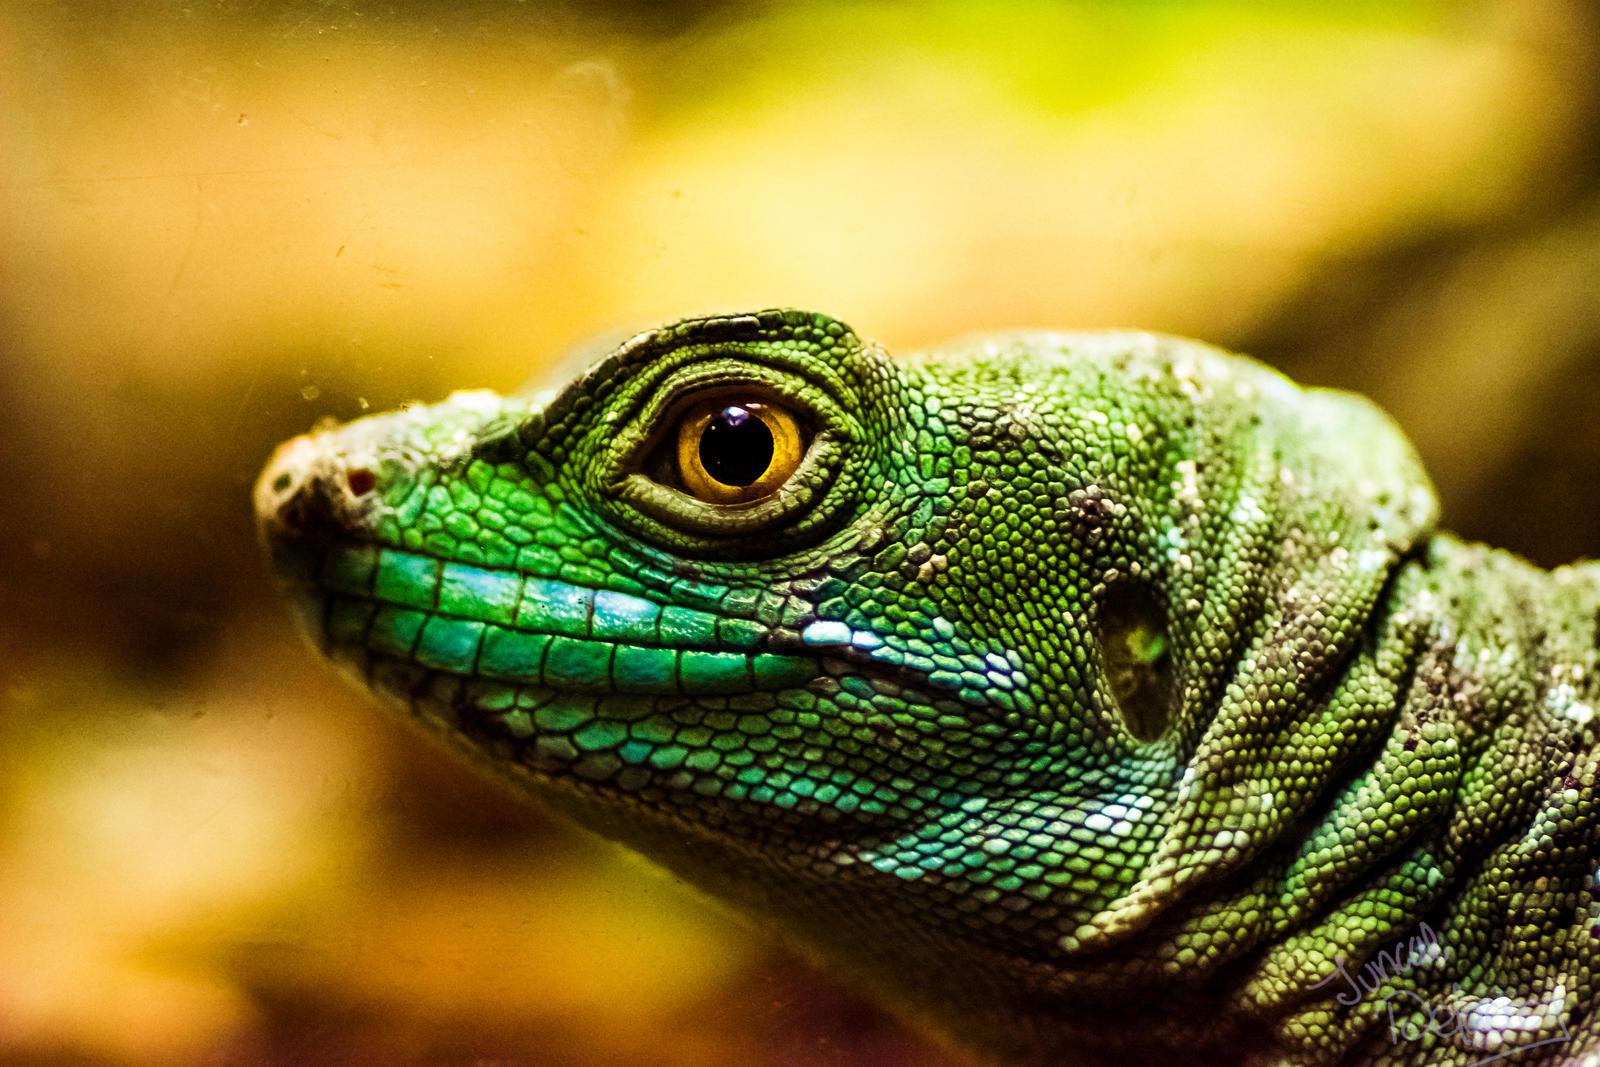 One Lizard by JuncalDelacroix